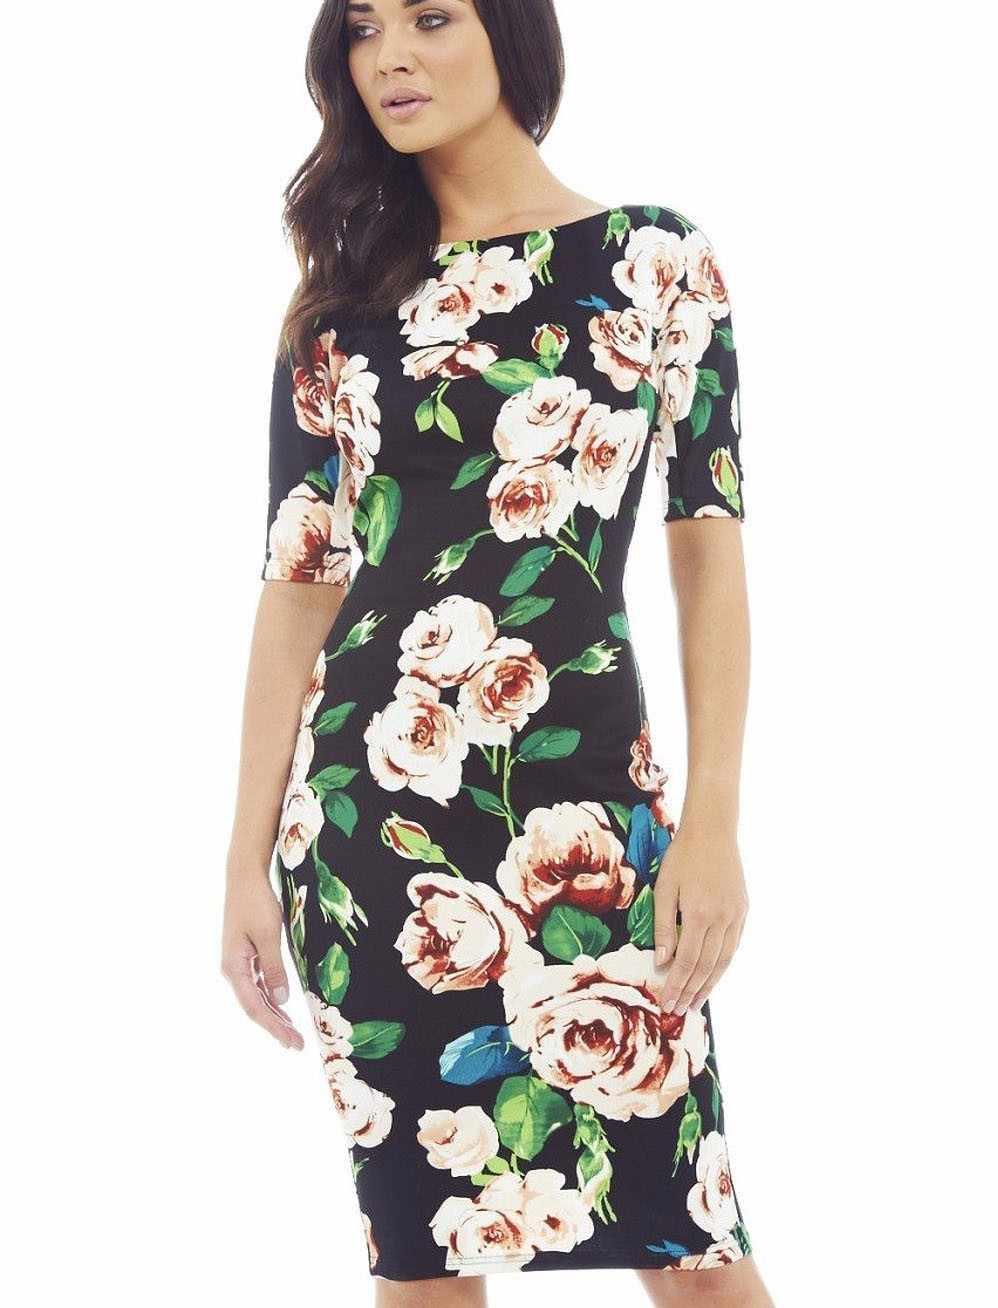 487a88caeb ... Women Dress Elegant Print Work Business Casual Party Summer Sheath  Vestidos Plus Size 106 ...